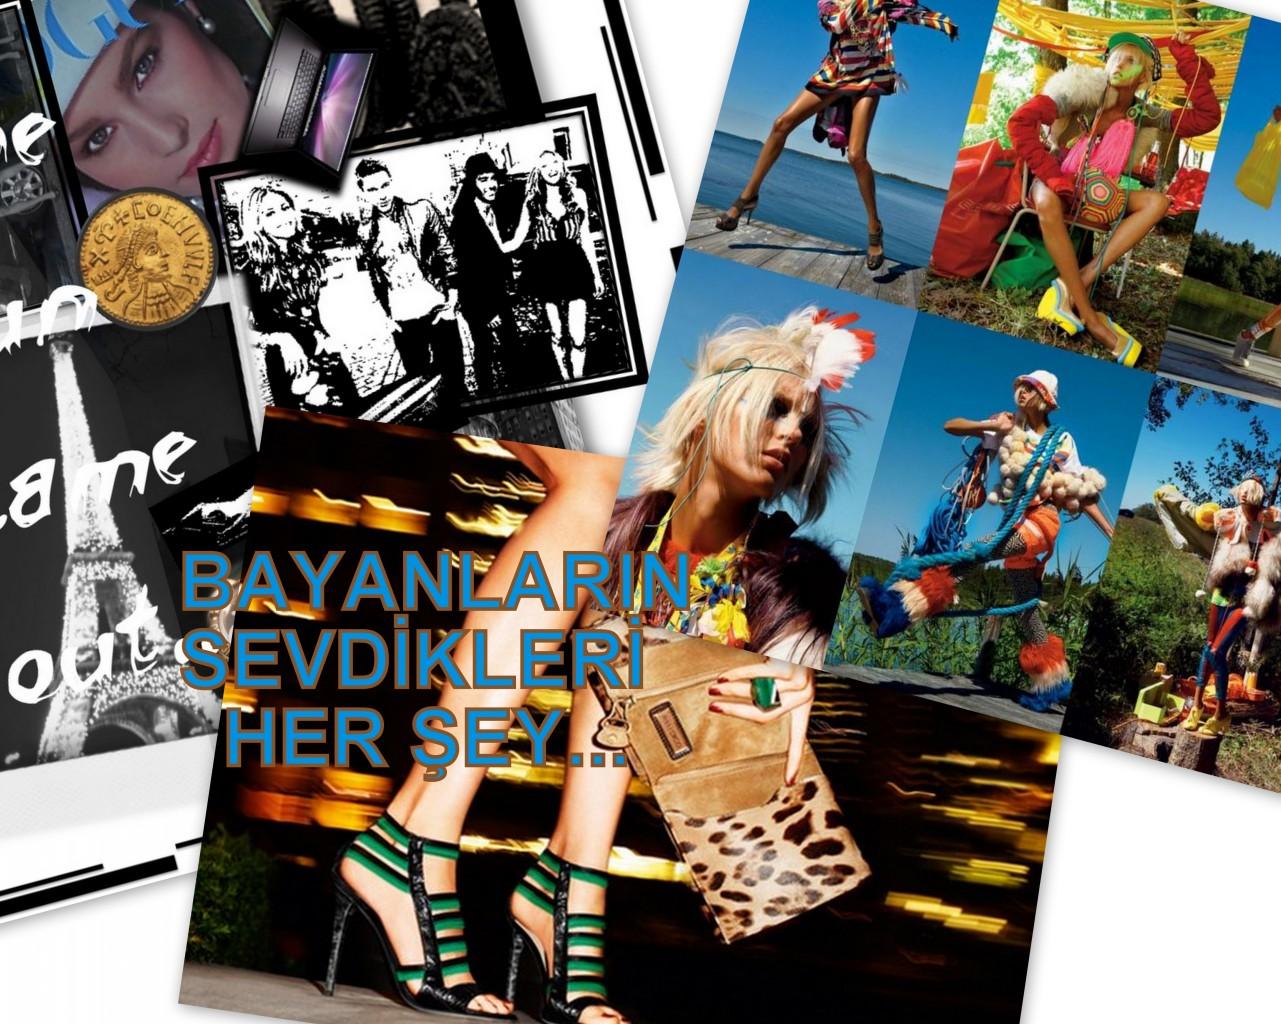 http://1.bp.blogspot.com/_RKTopnY__Aw/SykZLhtvnqI/AAAAAAAABDs/TyuauzPvTzg/S1600-R/styl.jpg